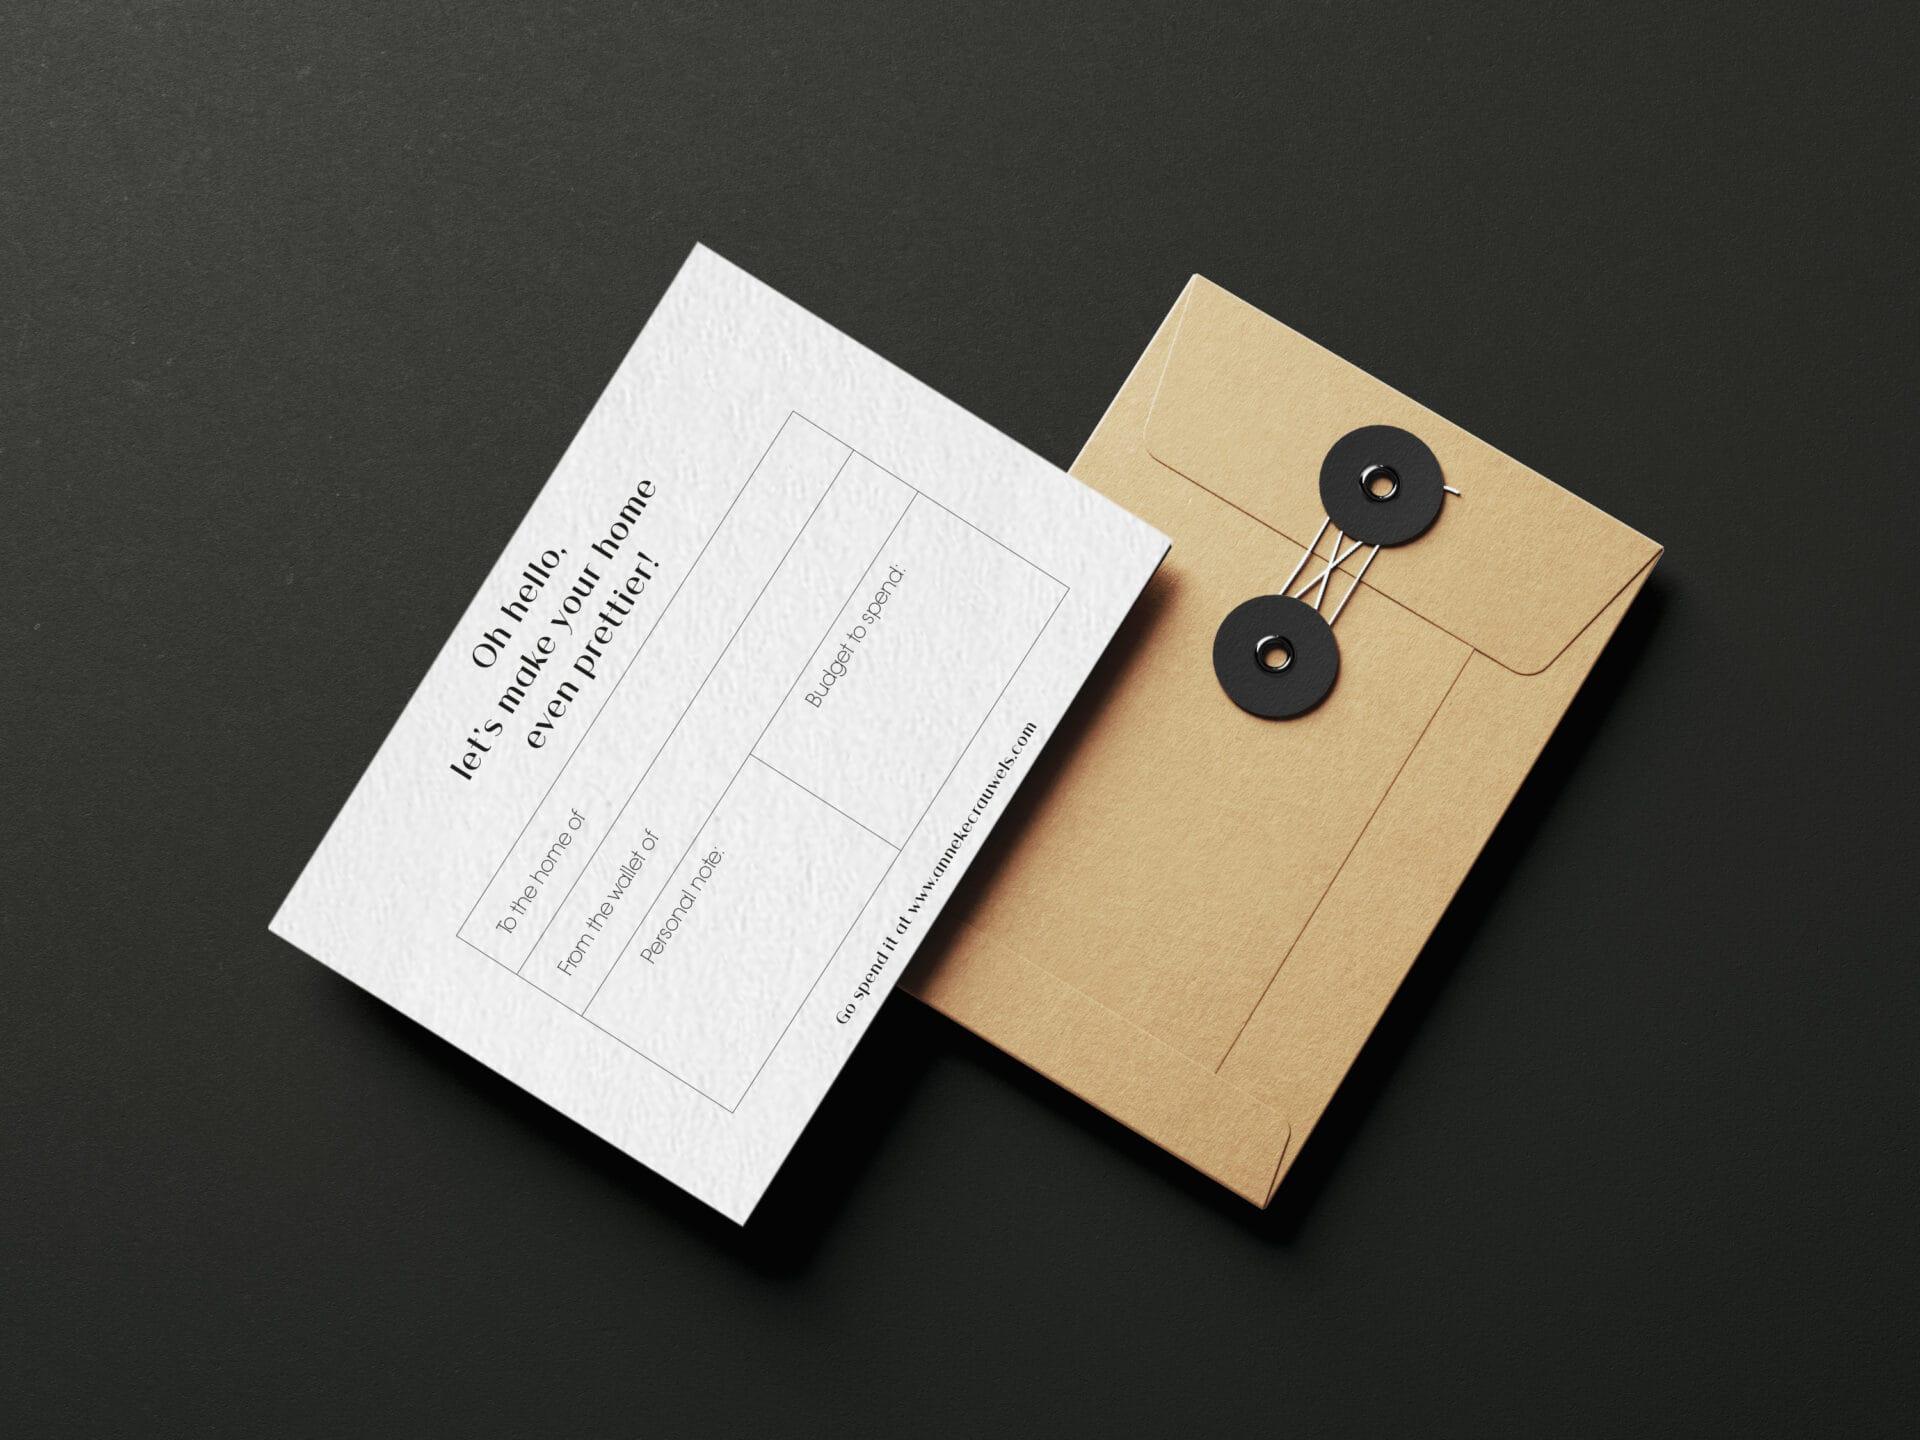 Giftcard Mockup | Design Studio Anneke Crauwels | Interieur | Mechelen